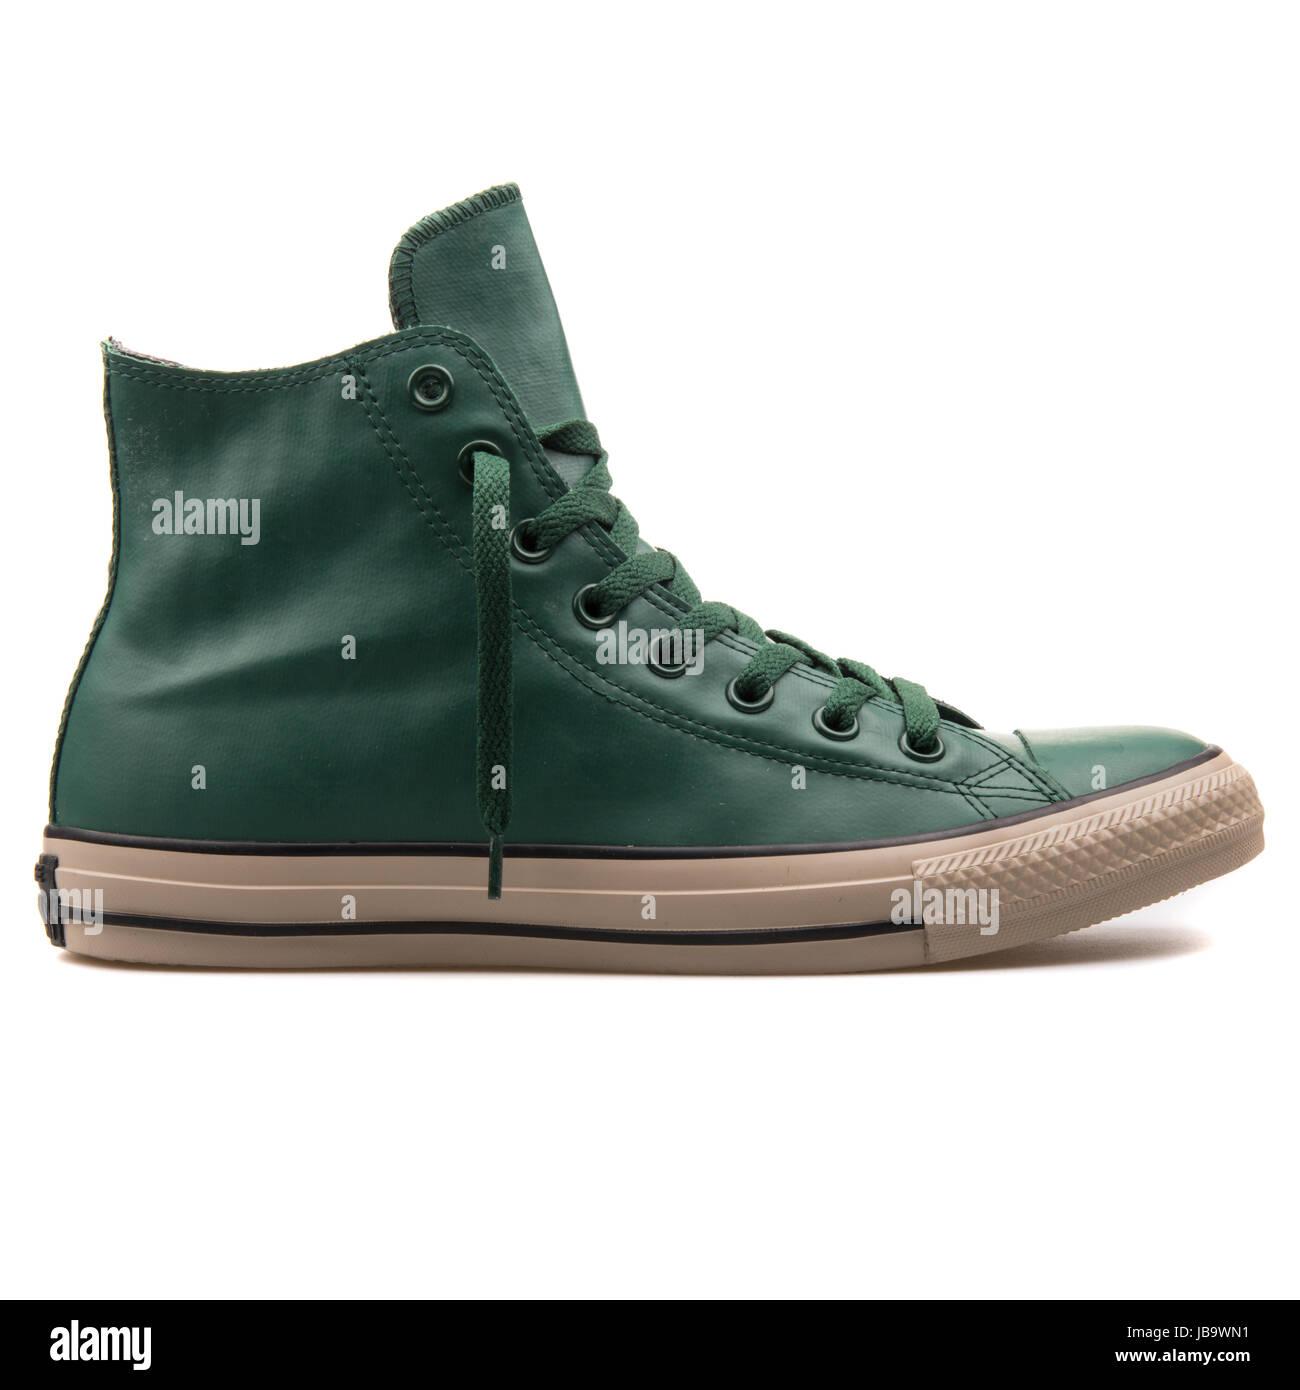 258ee069dc9dc1 Converse Chuck Taylor All Star Hi Gloom grün Unisex Schuhe - 149771C ...